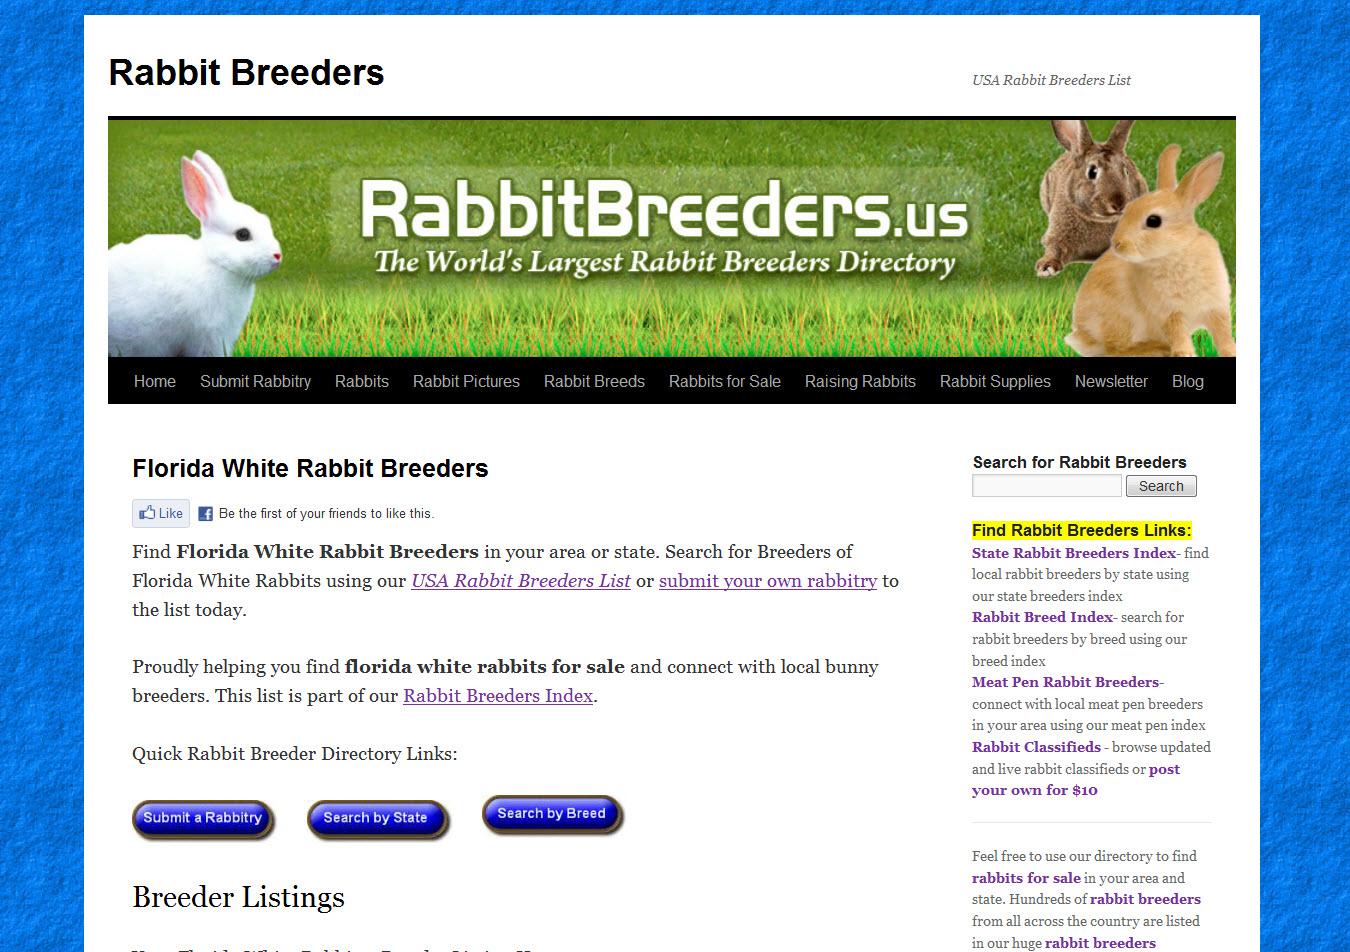 Florida White Rabbit Breeders